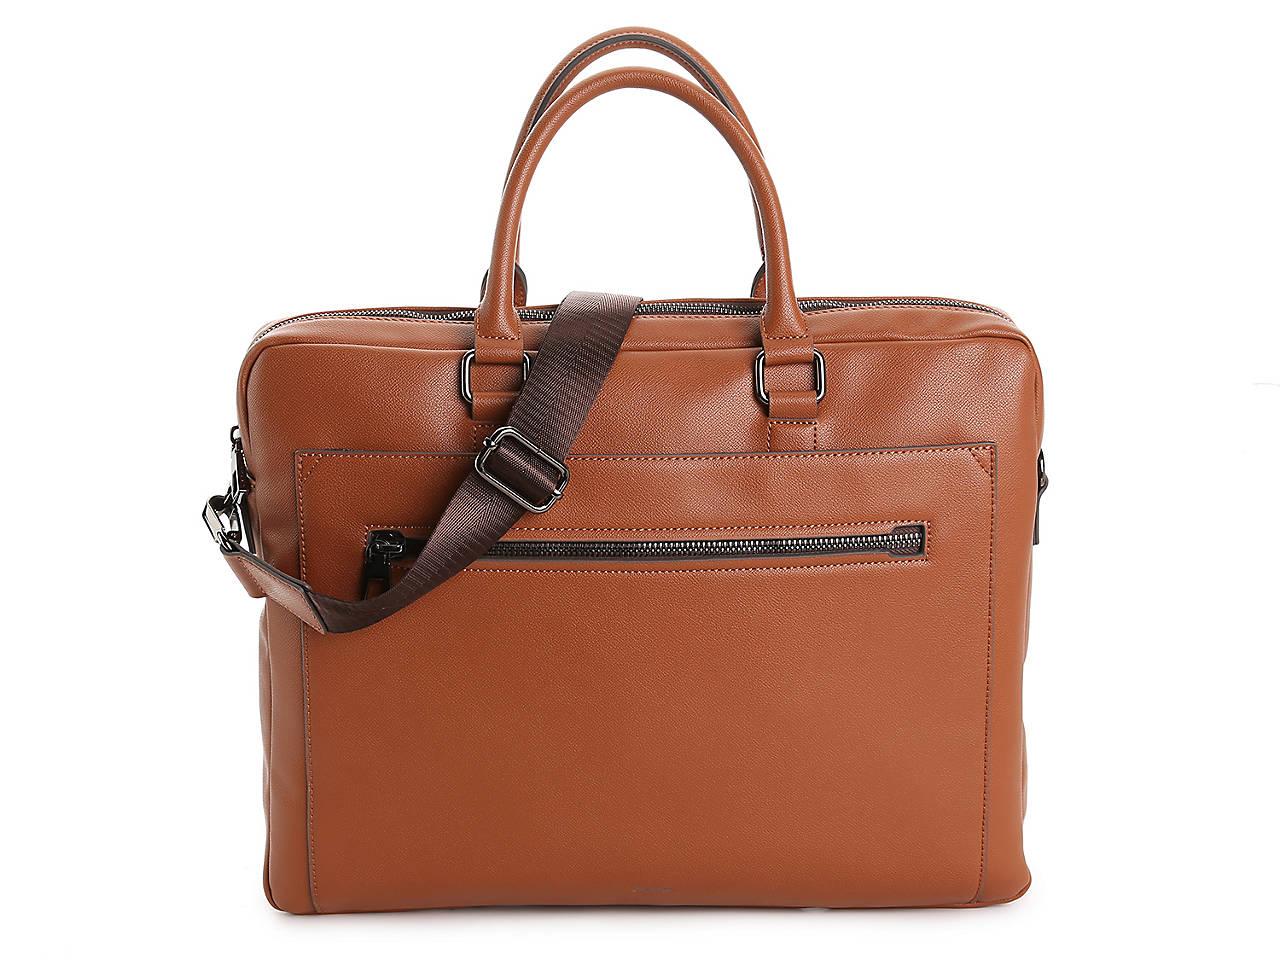 9b55a3886a0 Aldo Braunna Messenger Bag Men's Handbags & Accessories | DSW